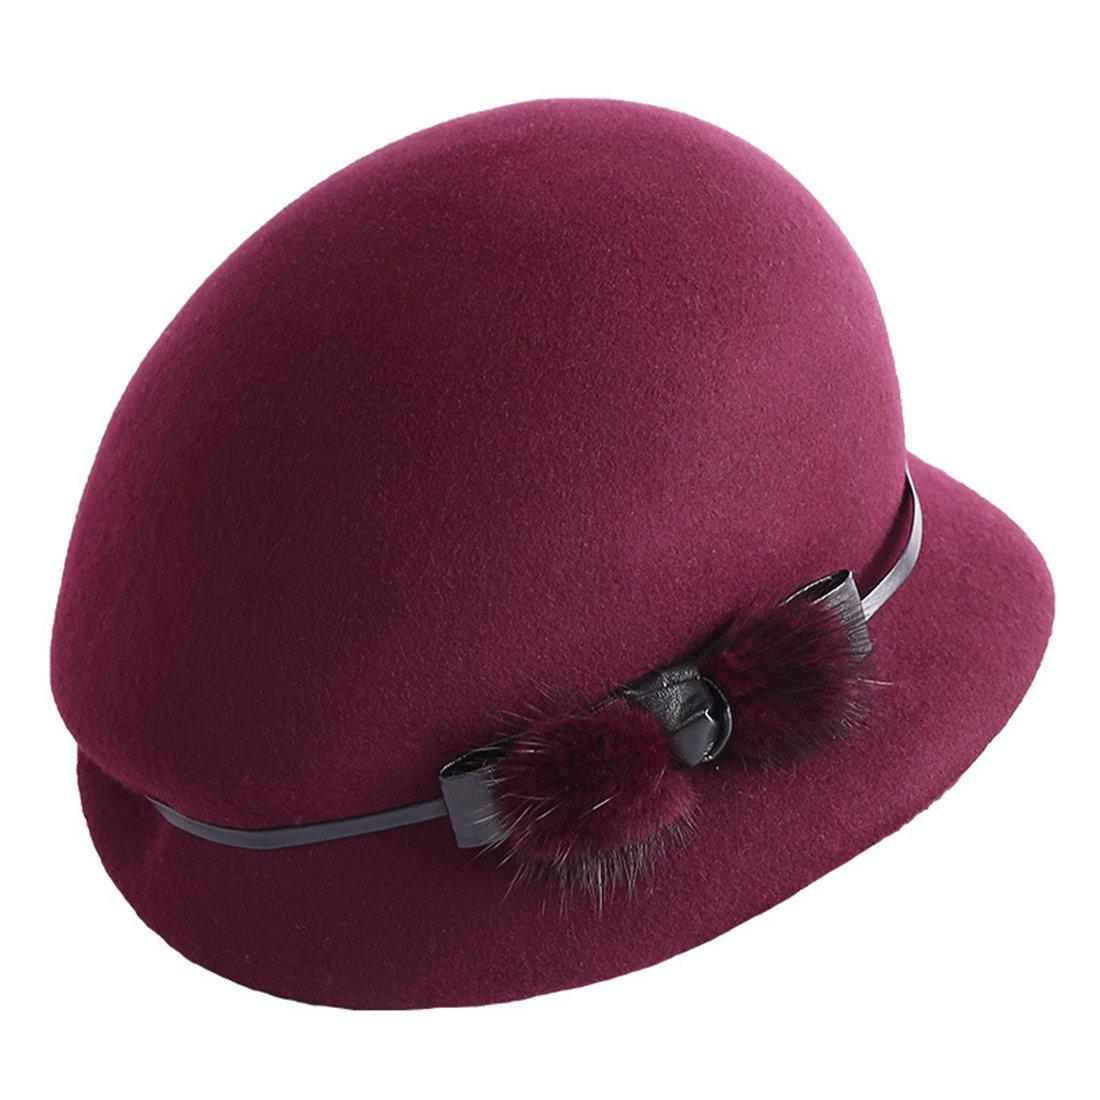 d3b3428b7d141 TTjII Womens hat With flower Bucket Bell Shaped Cap 1920s Vintage Wool Felt  Cloche Bucket Bowler Hat Winter Cocktail Beanie Cap Kentucky Derby Church  ...